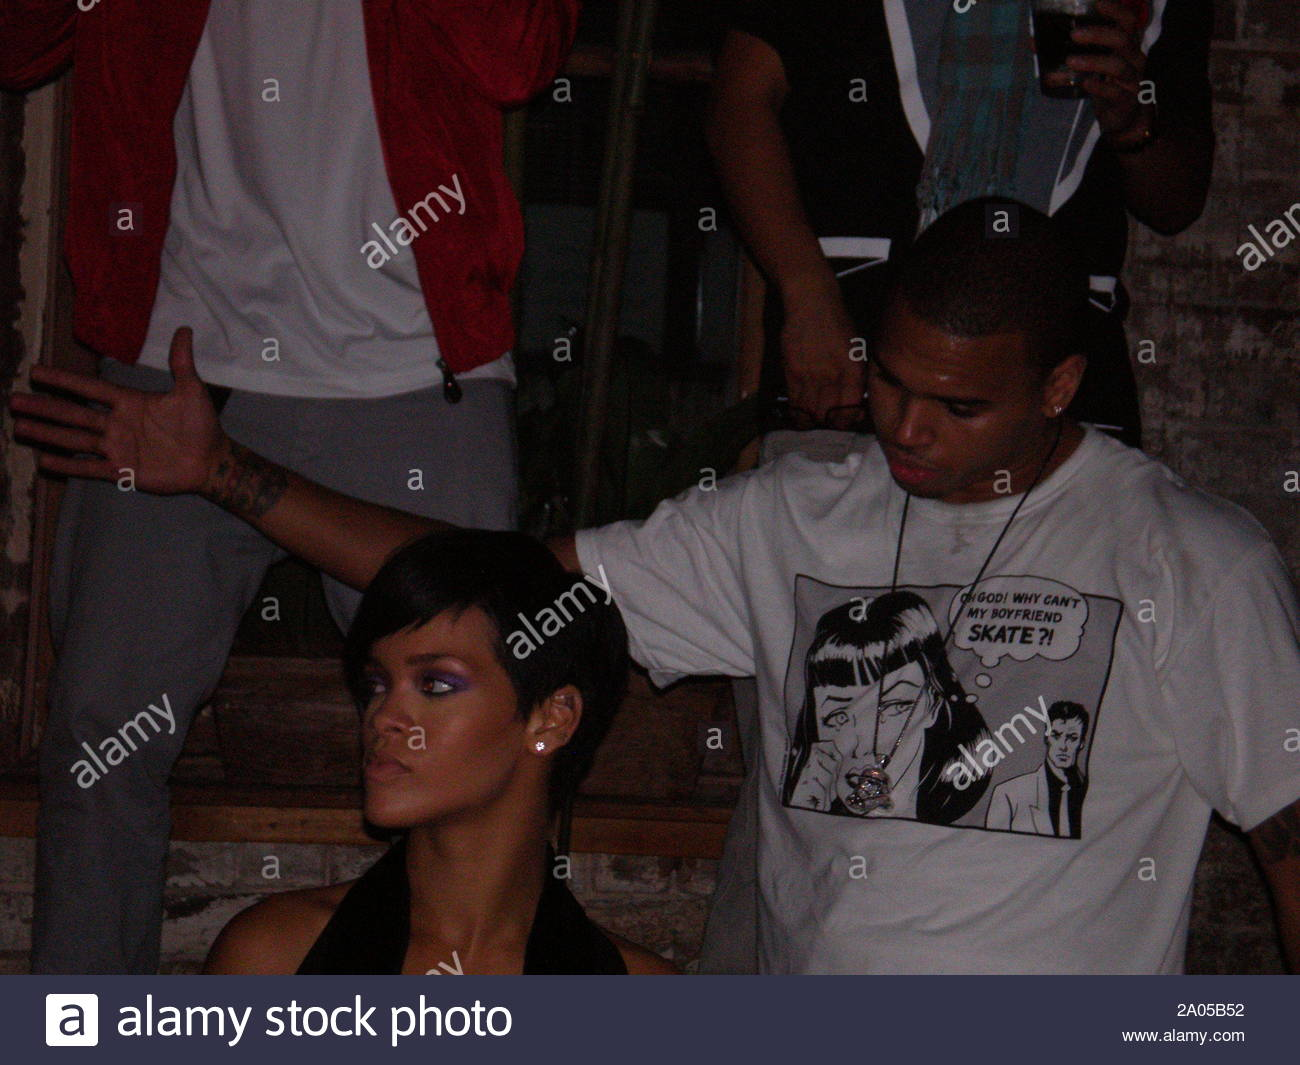 Rihanna e Chris Brown dating 2008 incontri online non incontro